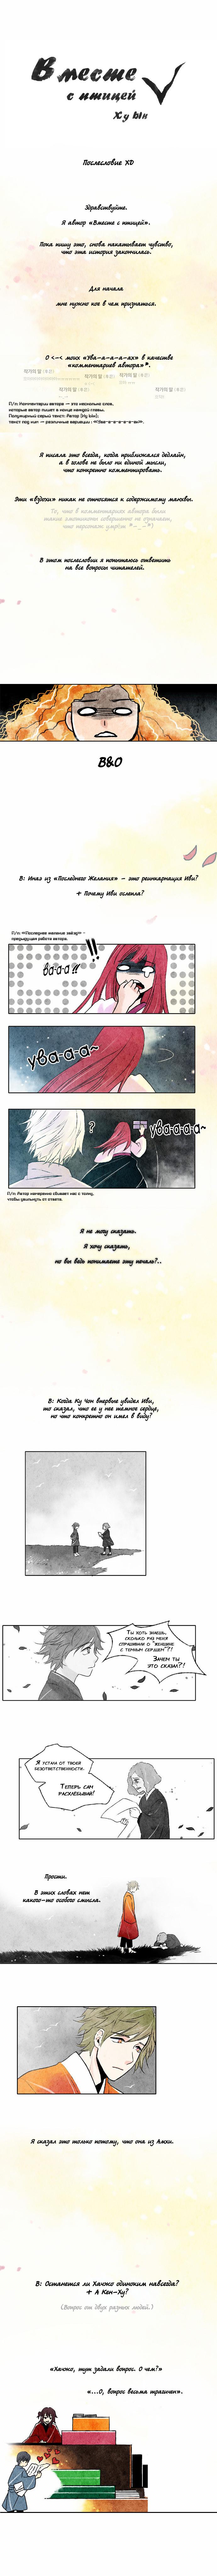 https://r1.ninemanga.com/comics/pic2/39/22503/1257061/1541334908816.jpg Page 1